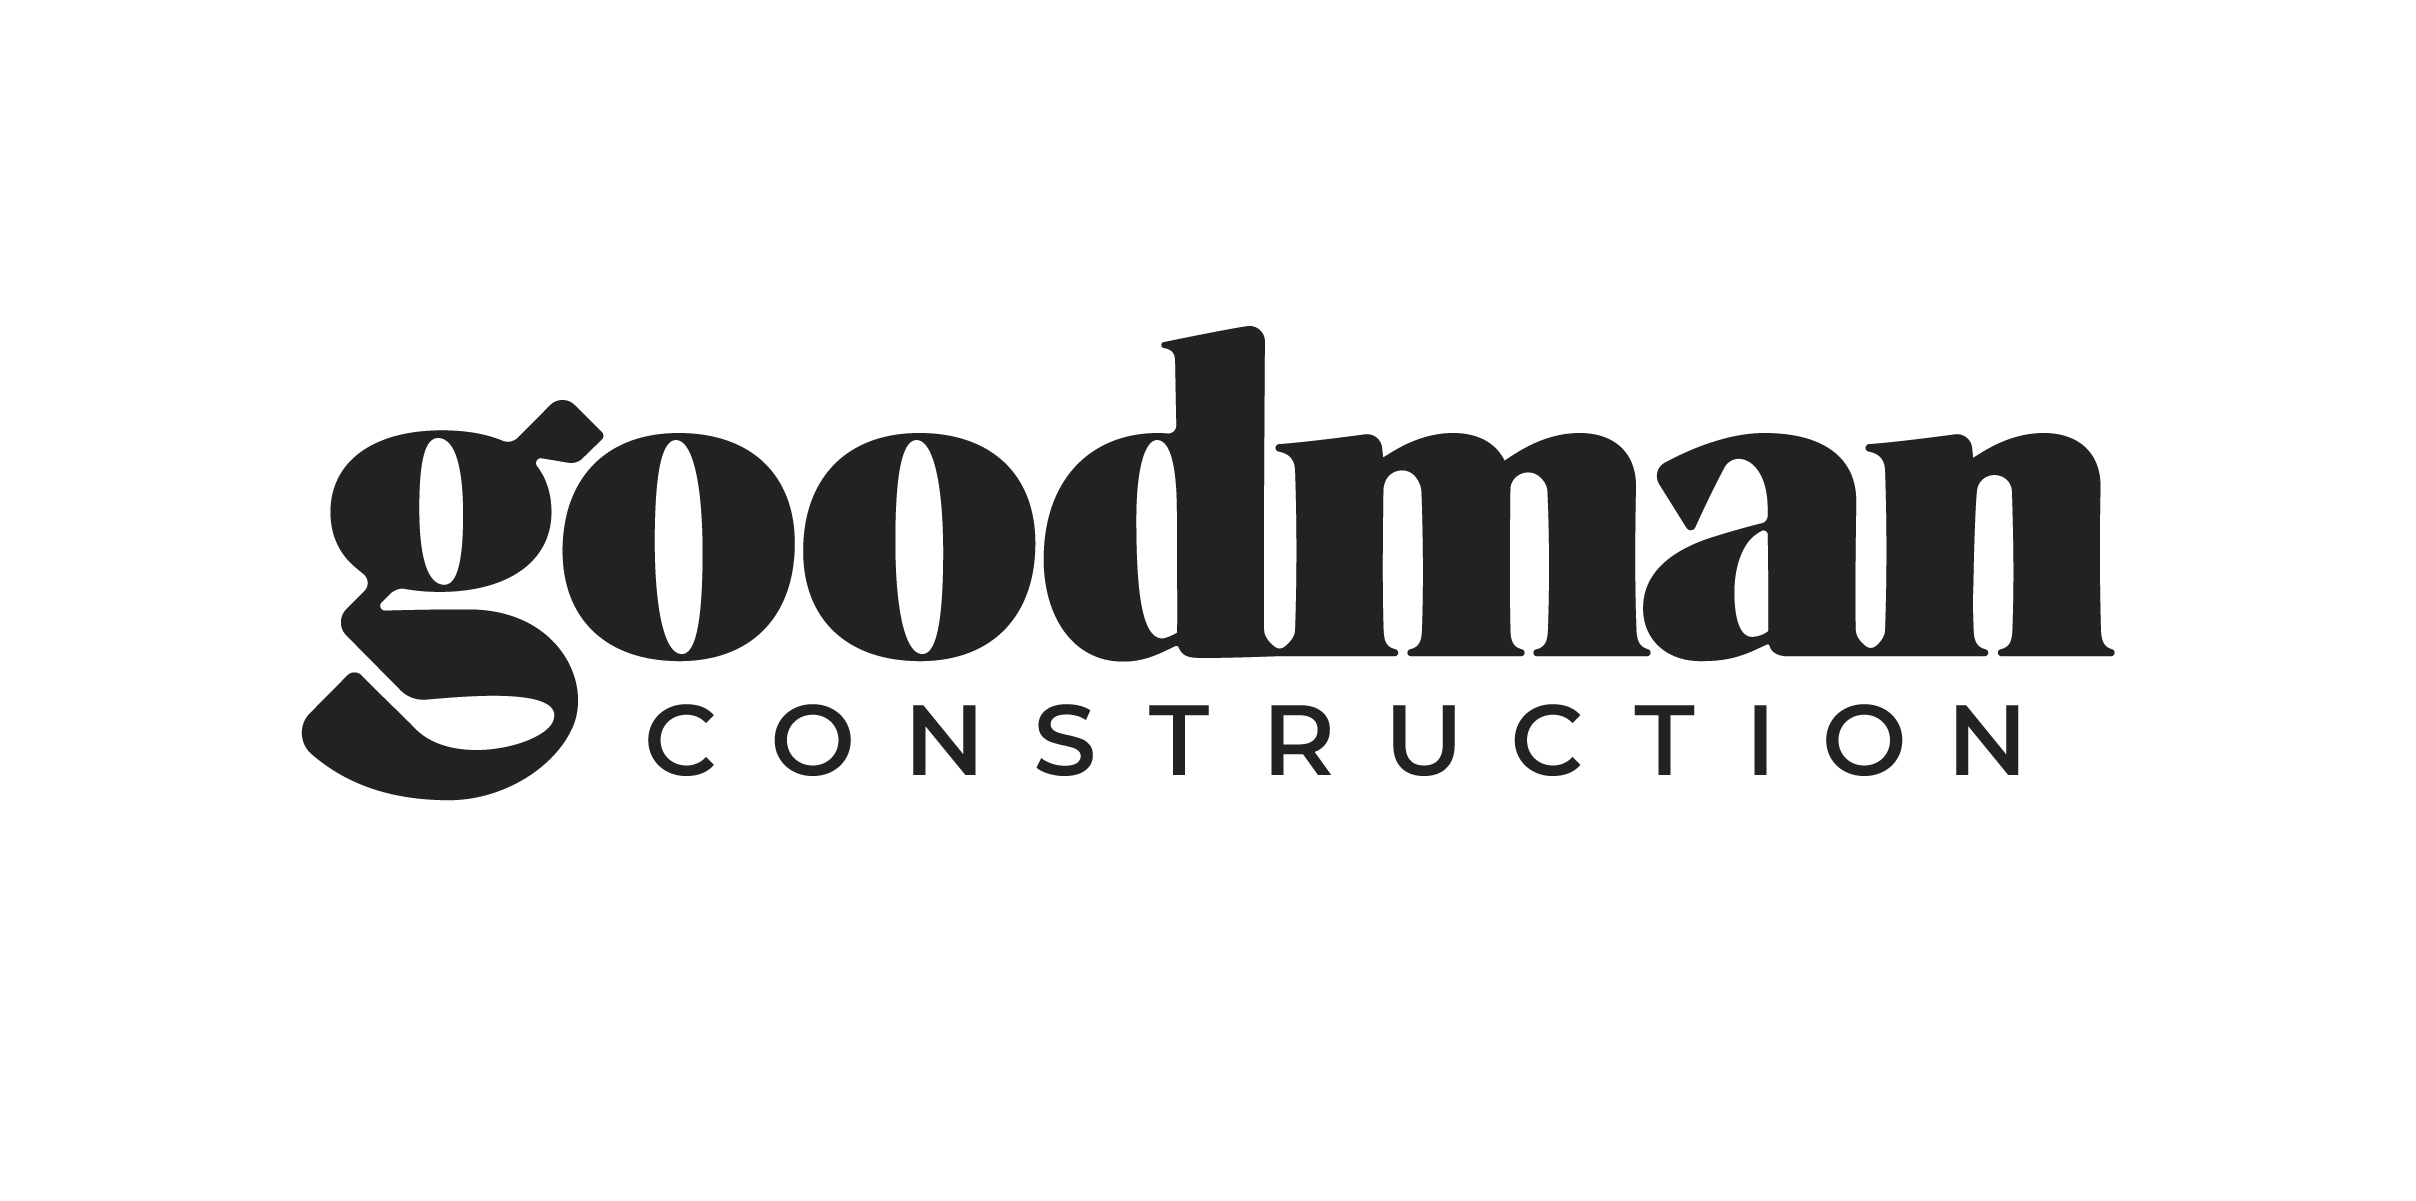 Goodman Construction